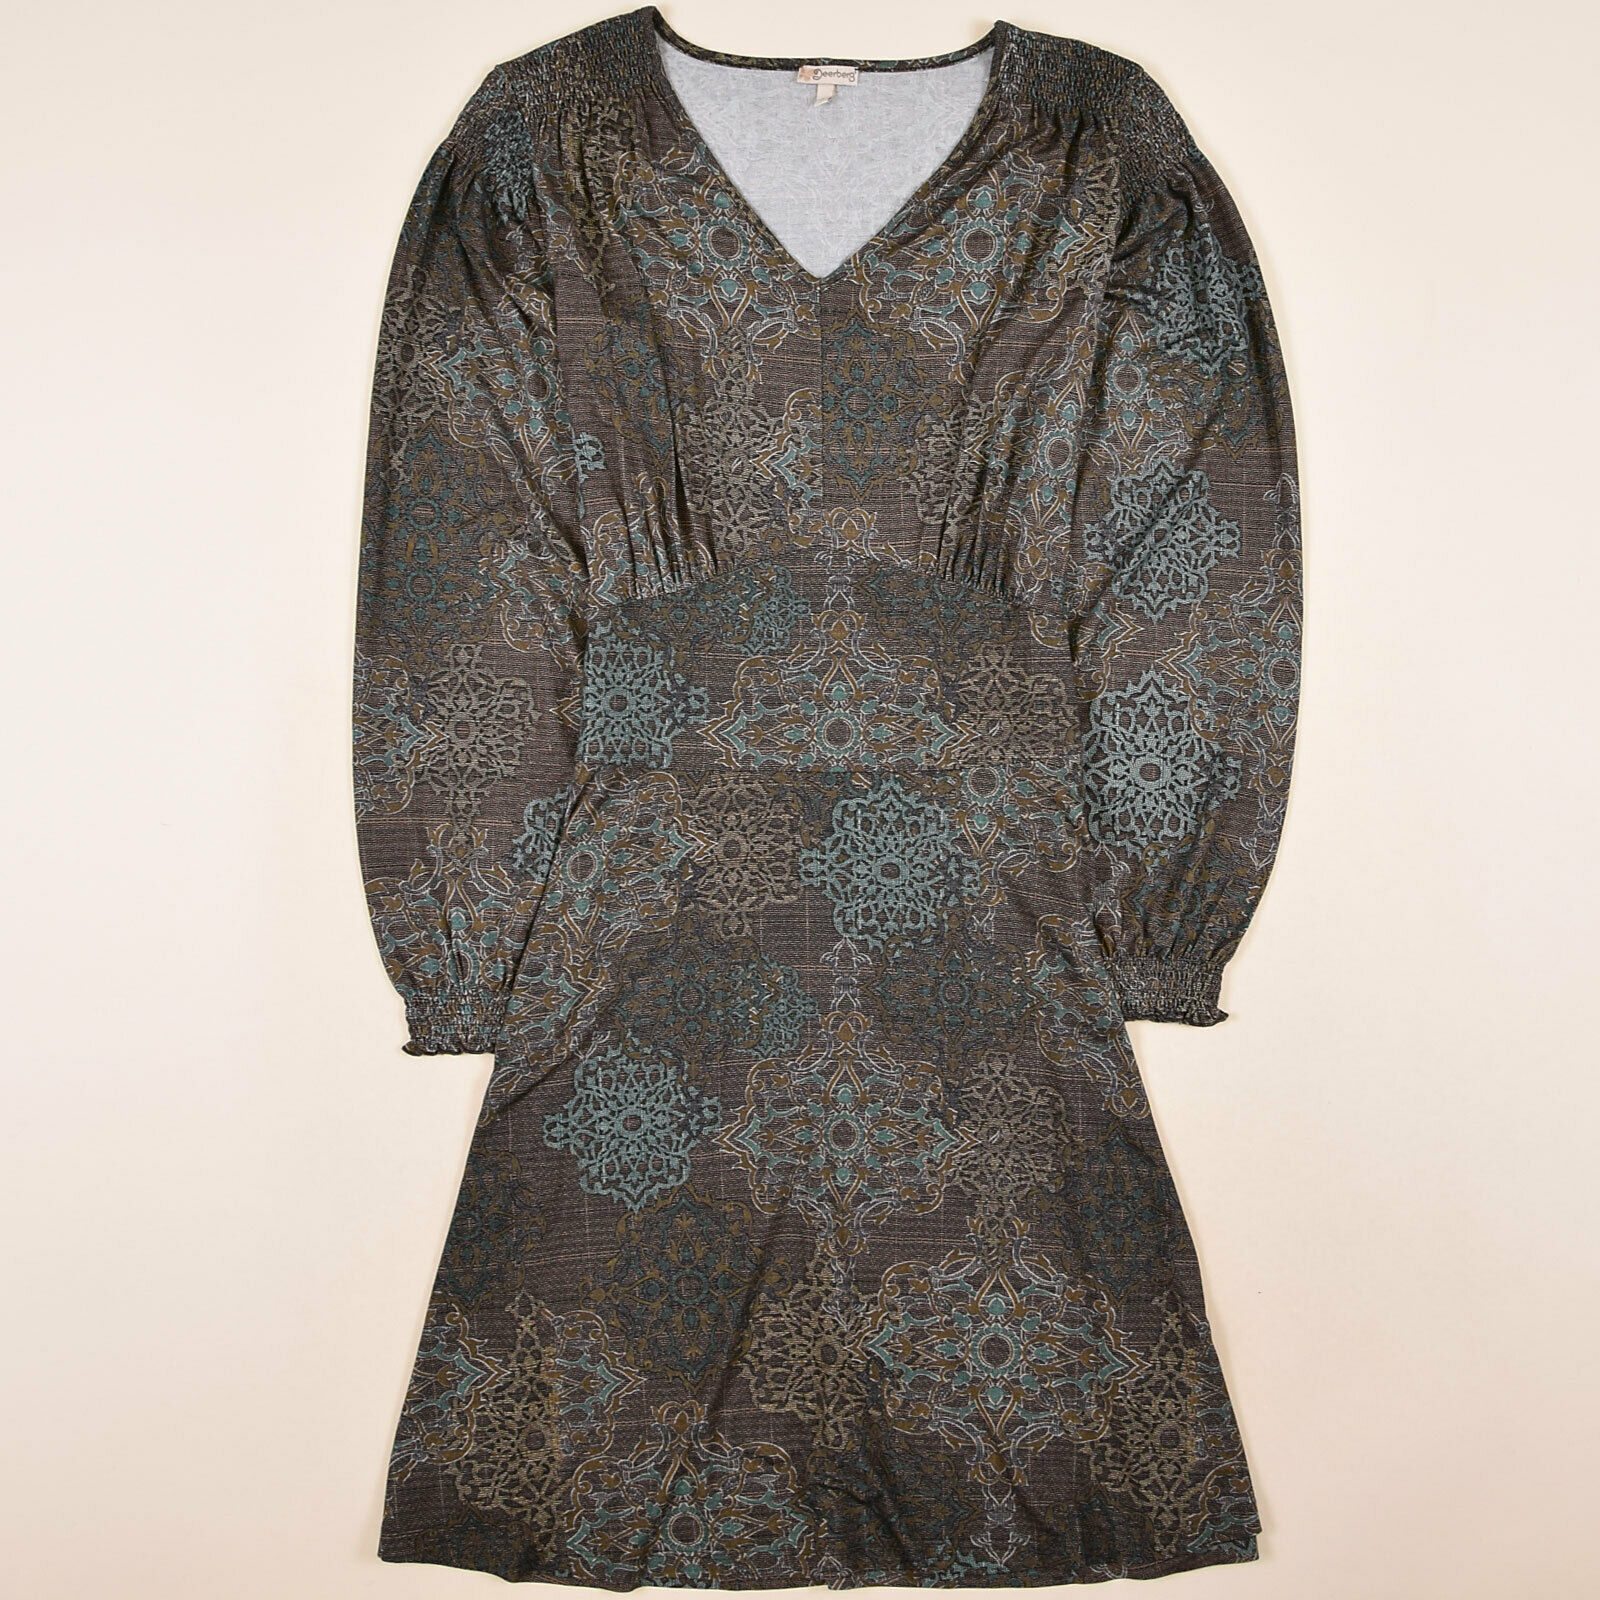 Deerberg Damen Kleid Dress A-Linien-Kleid Gr.S (36) Jersey Casual Freizeit 86860